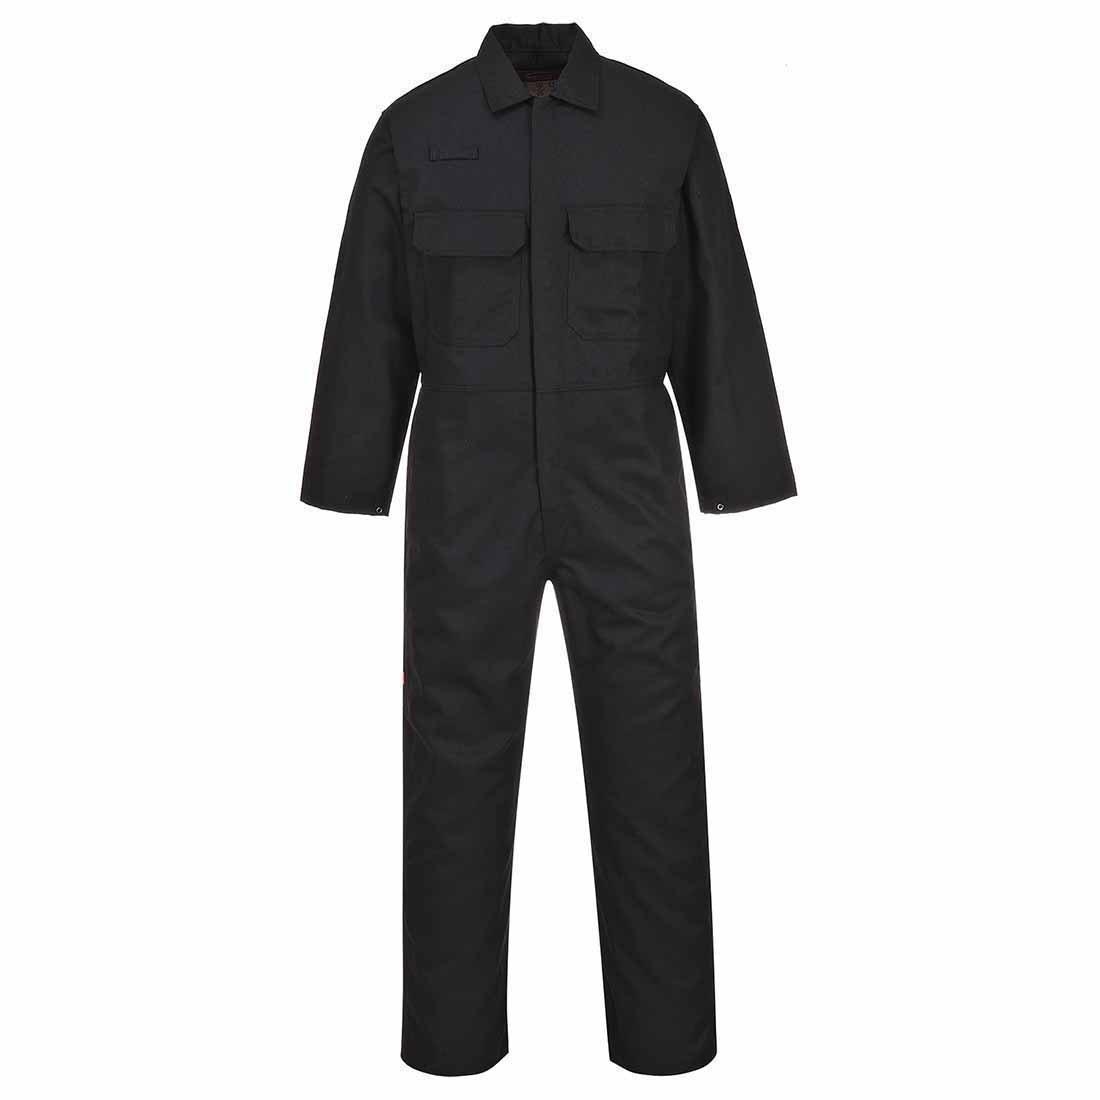 Portwest BIZ1 BizWeld boilersuit talla Medium color BlackT